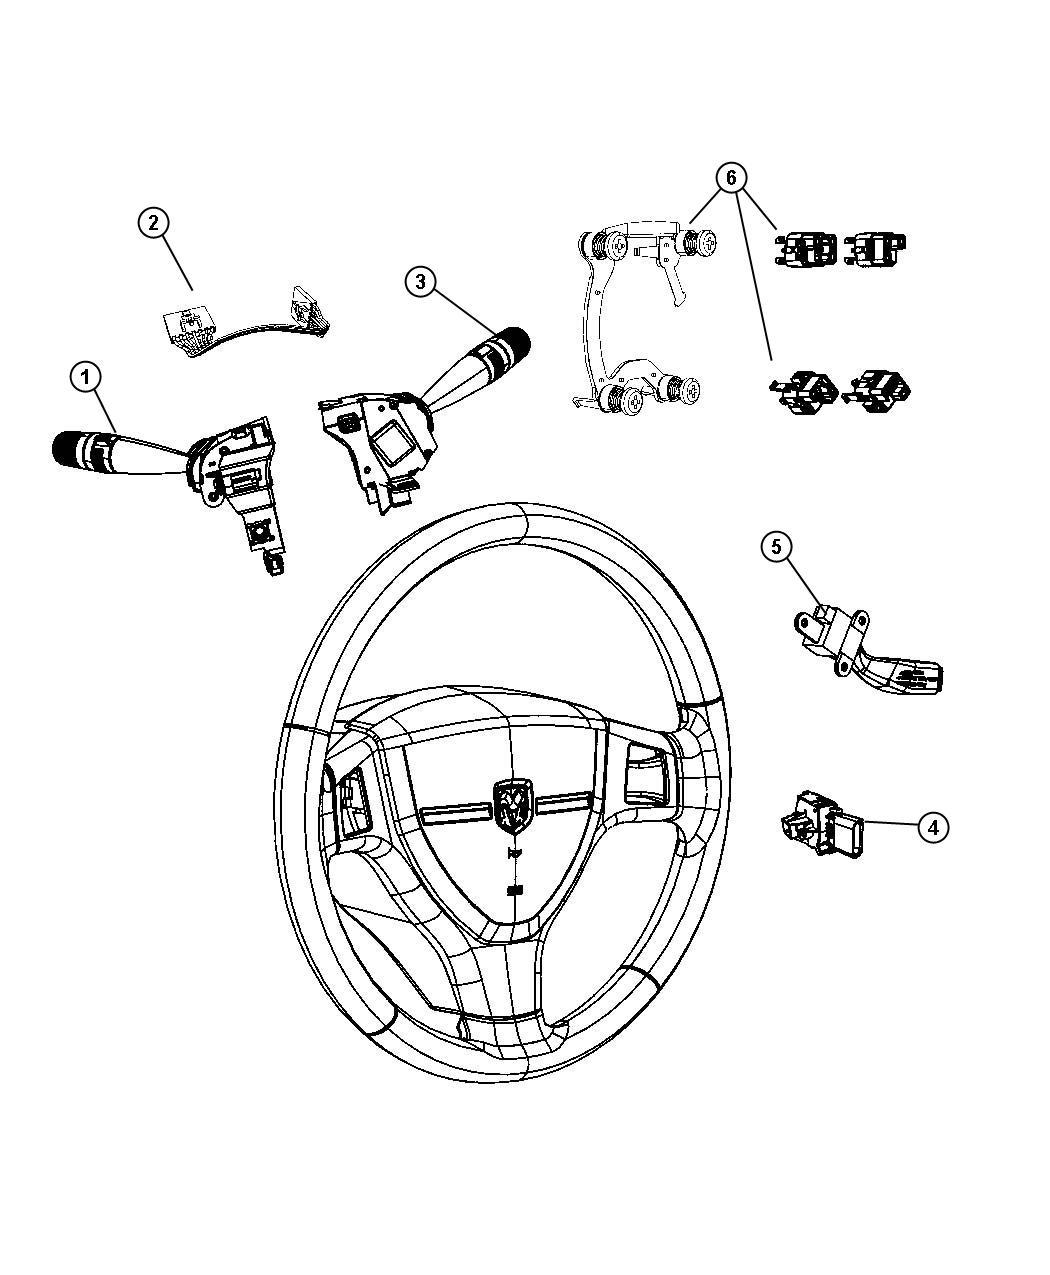 Chrysler Pt Cruiser Switch Horn Speed Control